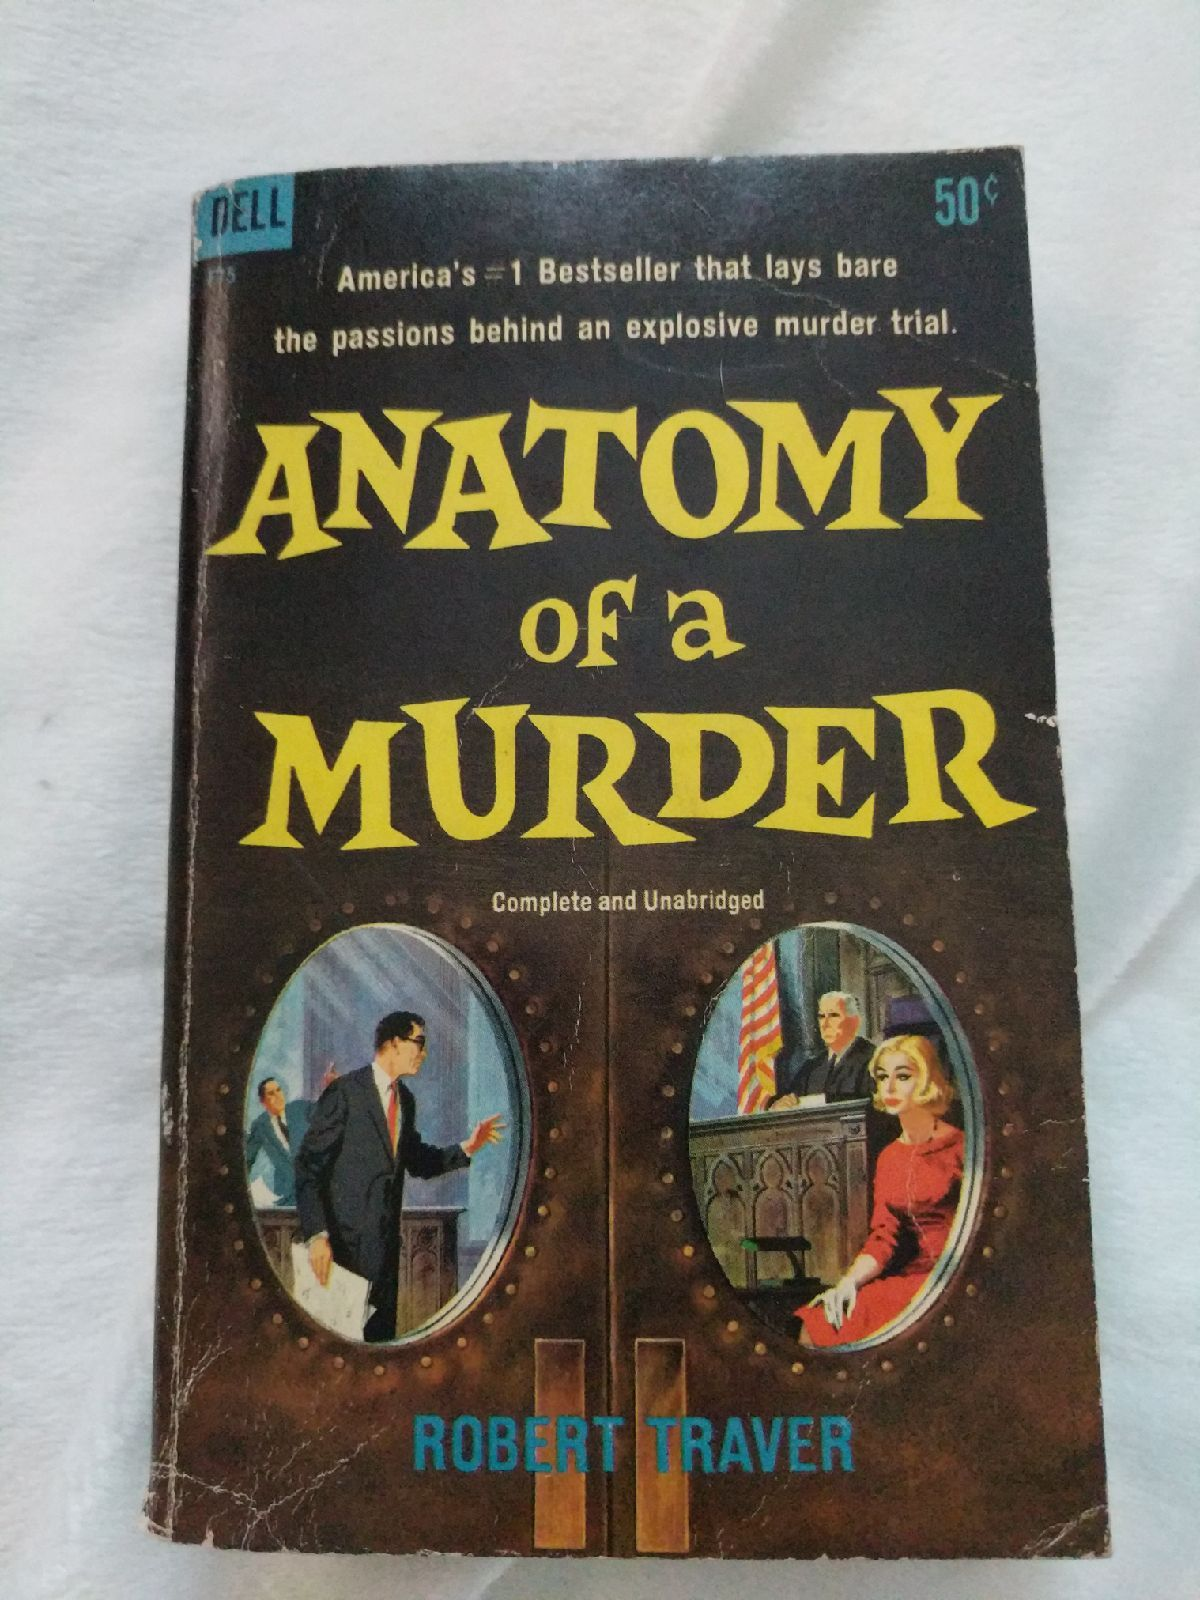 Vintage anatomy of a murderer paperback   Books Worth Reading ...